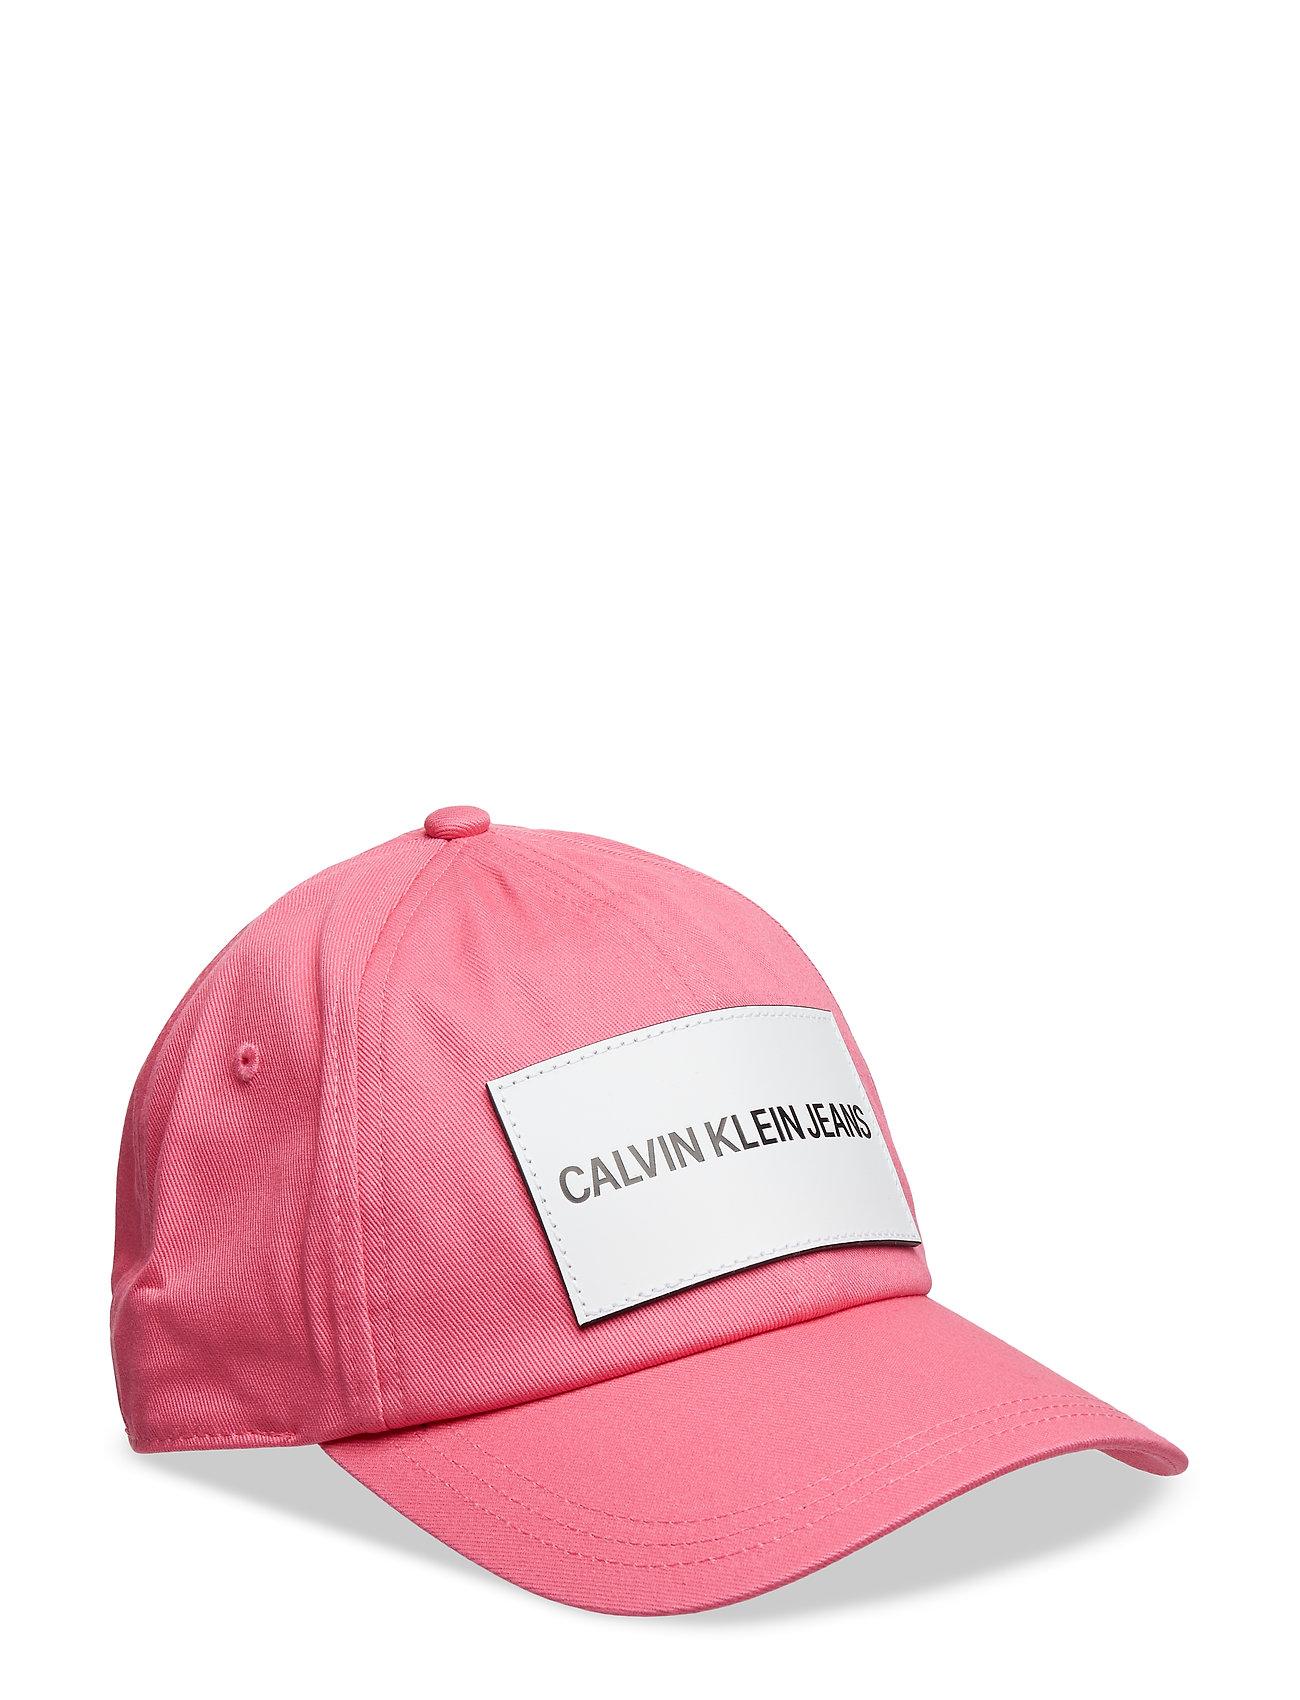 Image of J Calvin Klein Jeans Accessories Headwear Caps Lyserød Calvin Klein (3094066307)